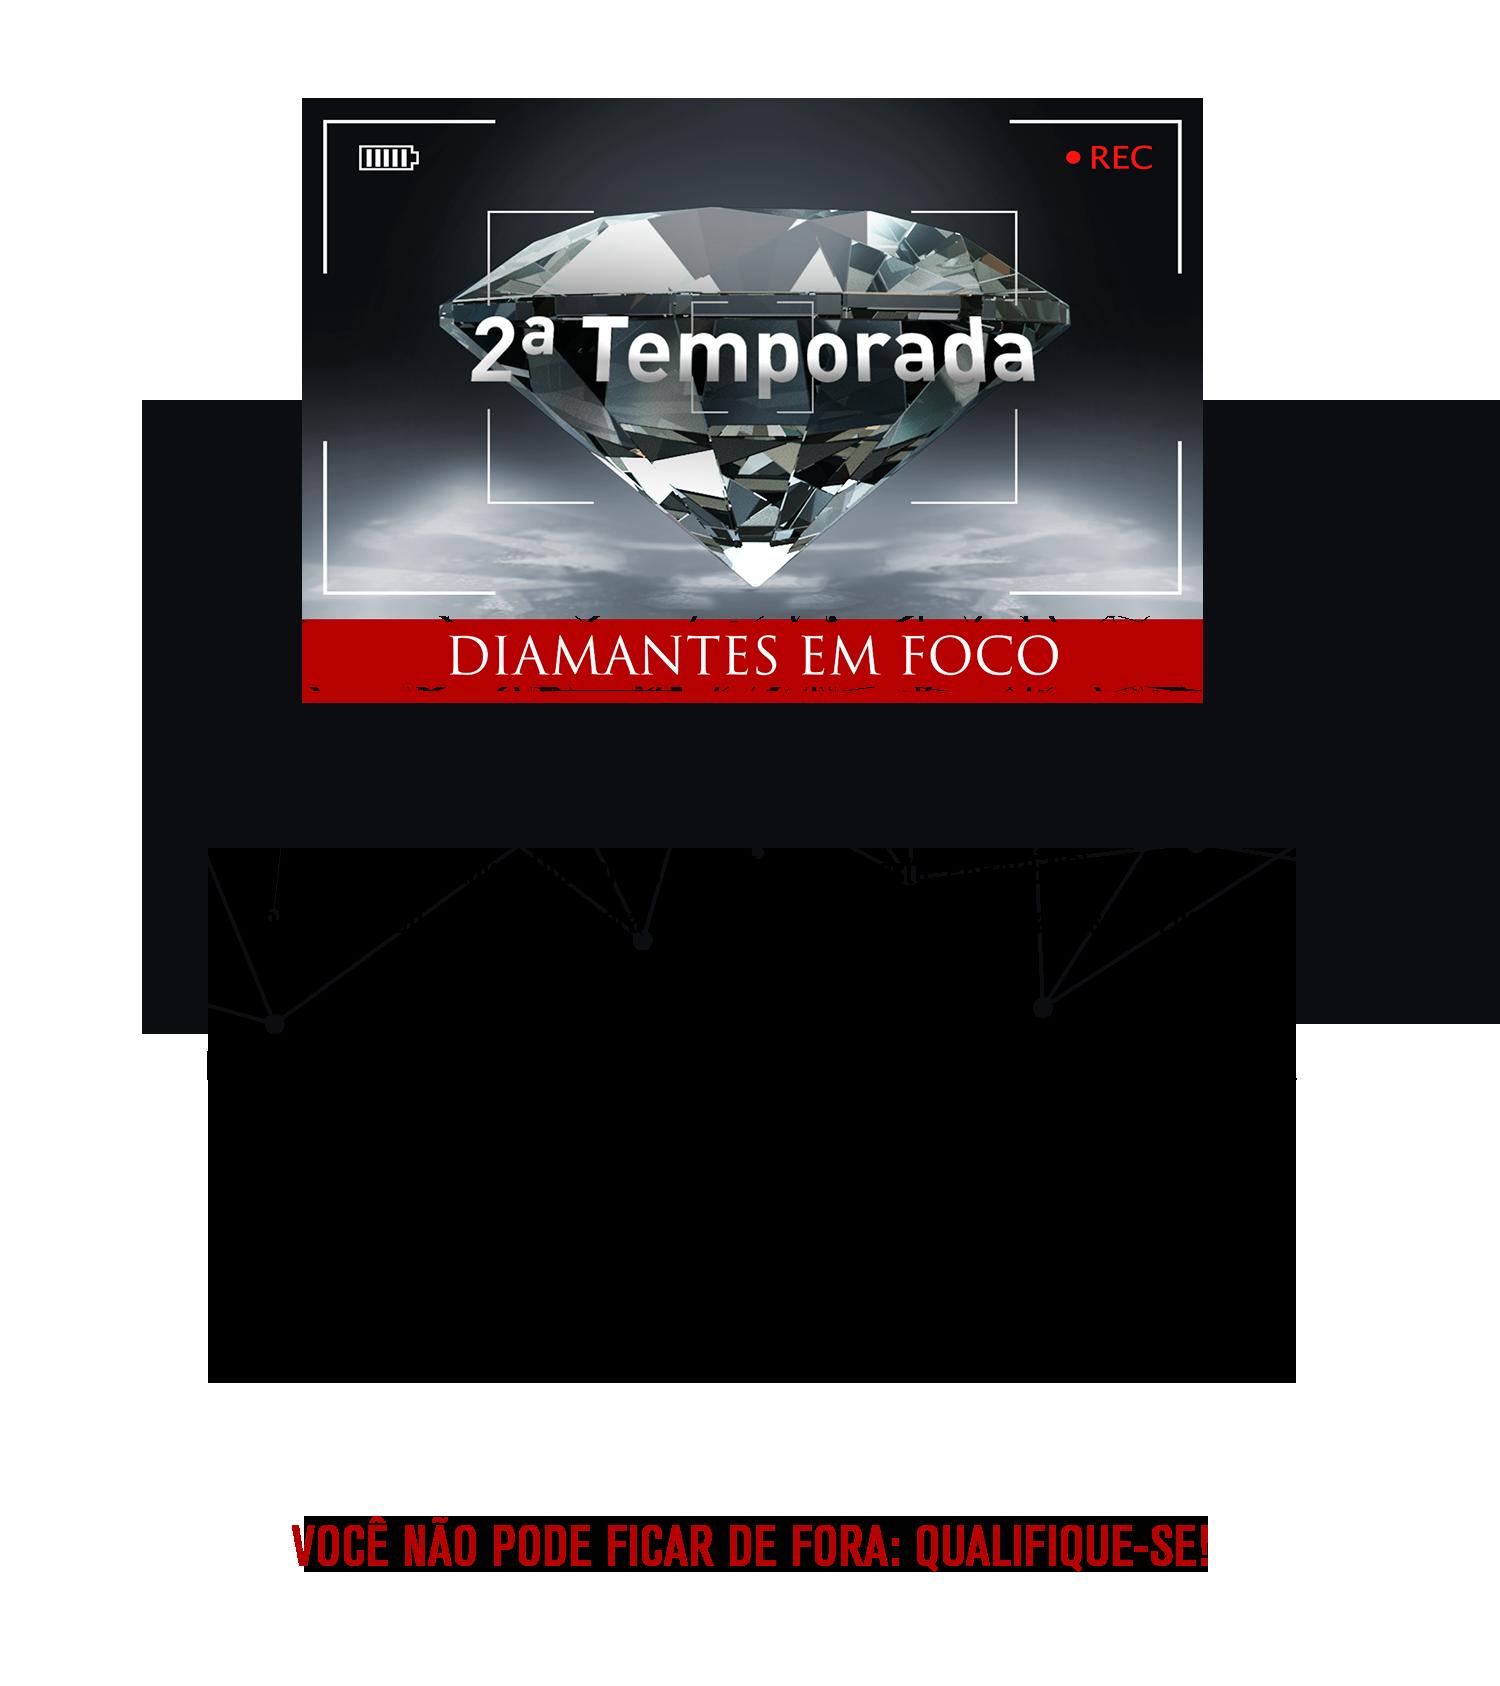 diamantesemfoco_002